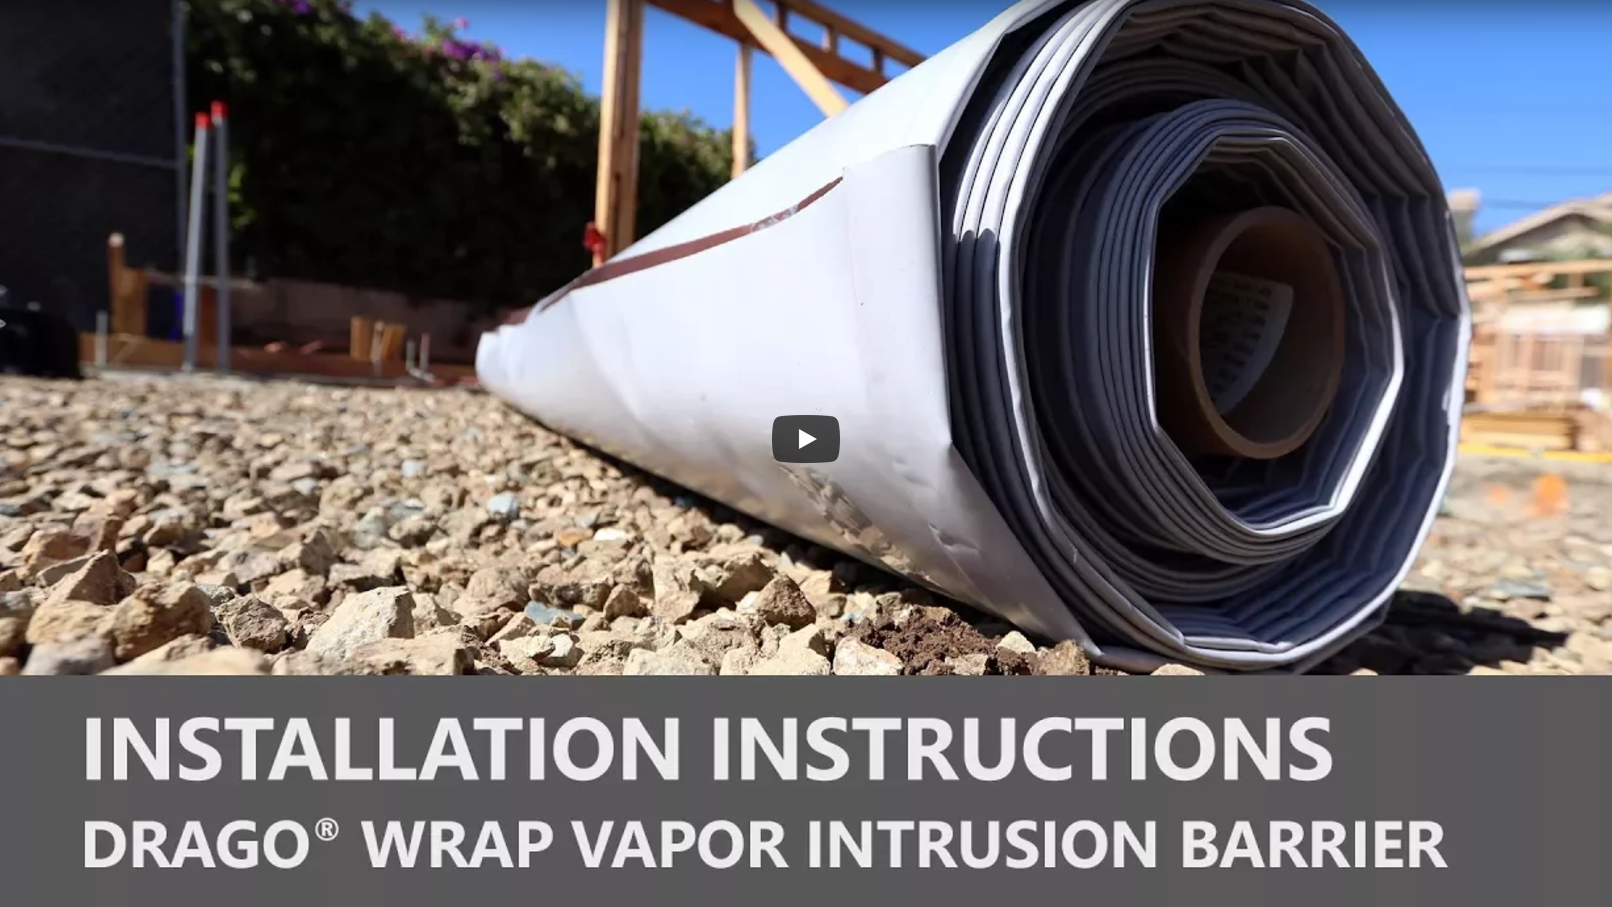 Drago Wrap Vapor Intrusion Barrier Installation Instructions Video